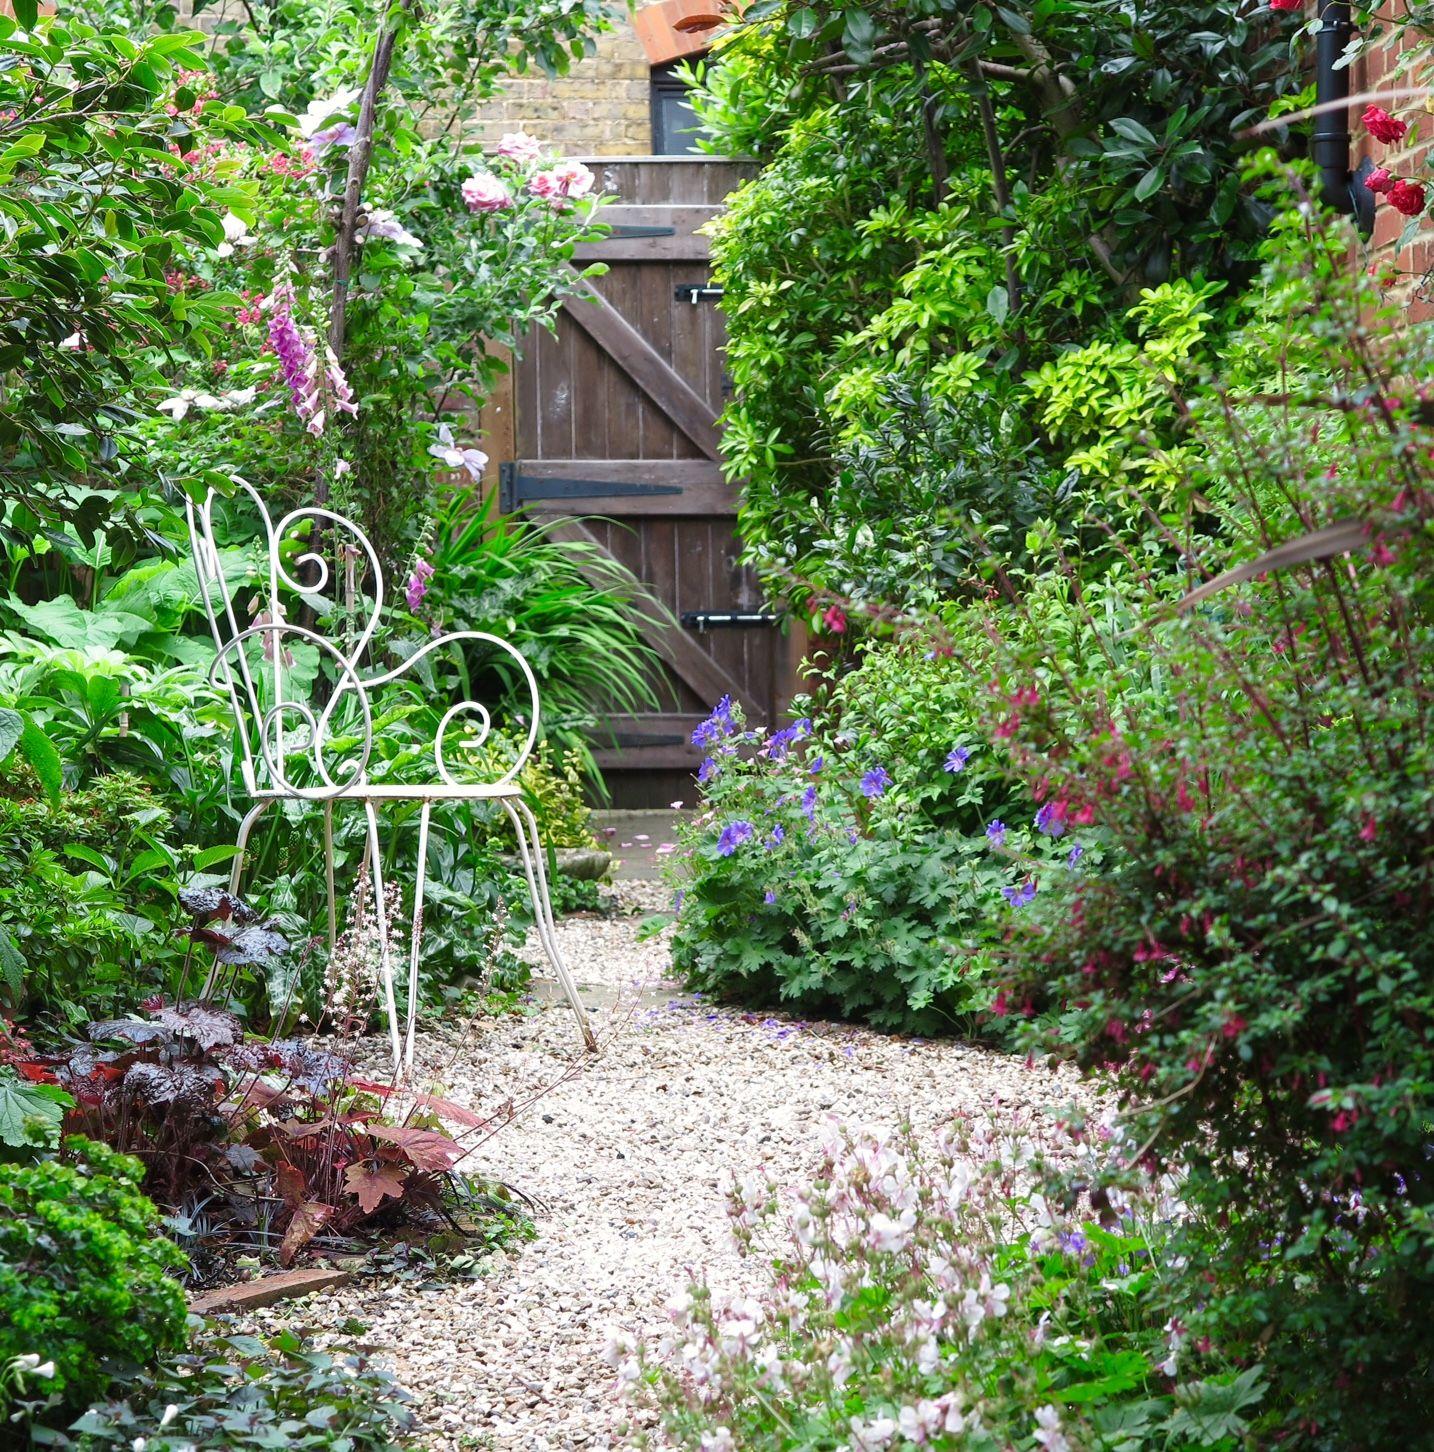 57 Amazing Beautiful Garden Ideas Inspiration And: 8 Effective Tips For Narrow Town Garden Success